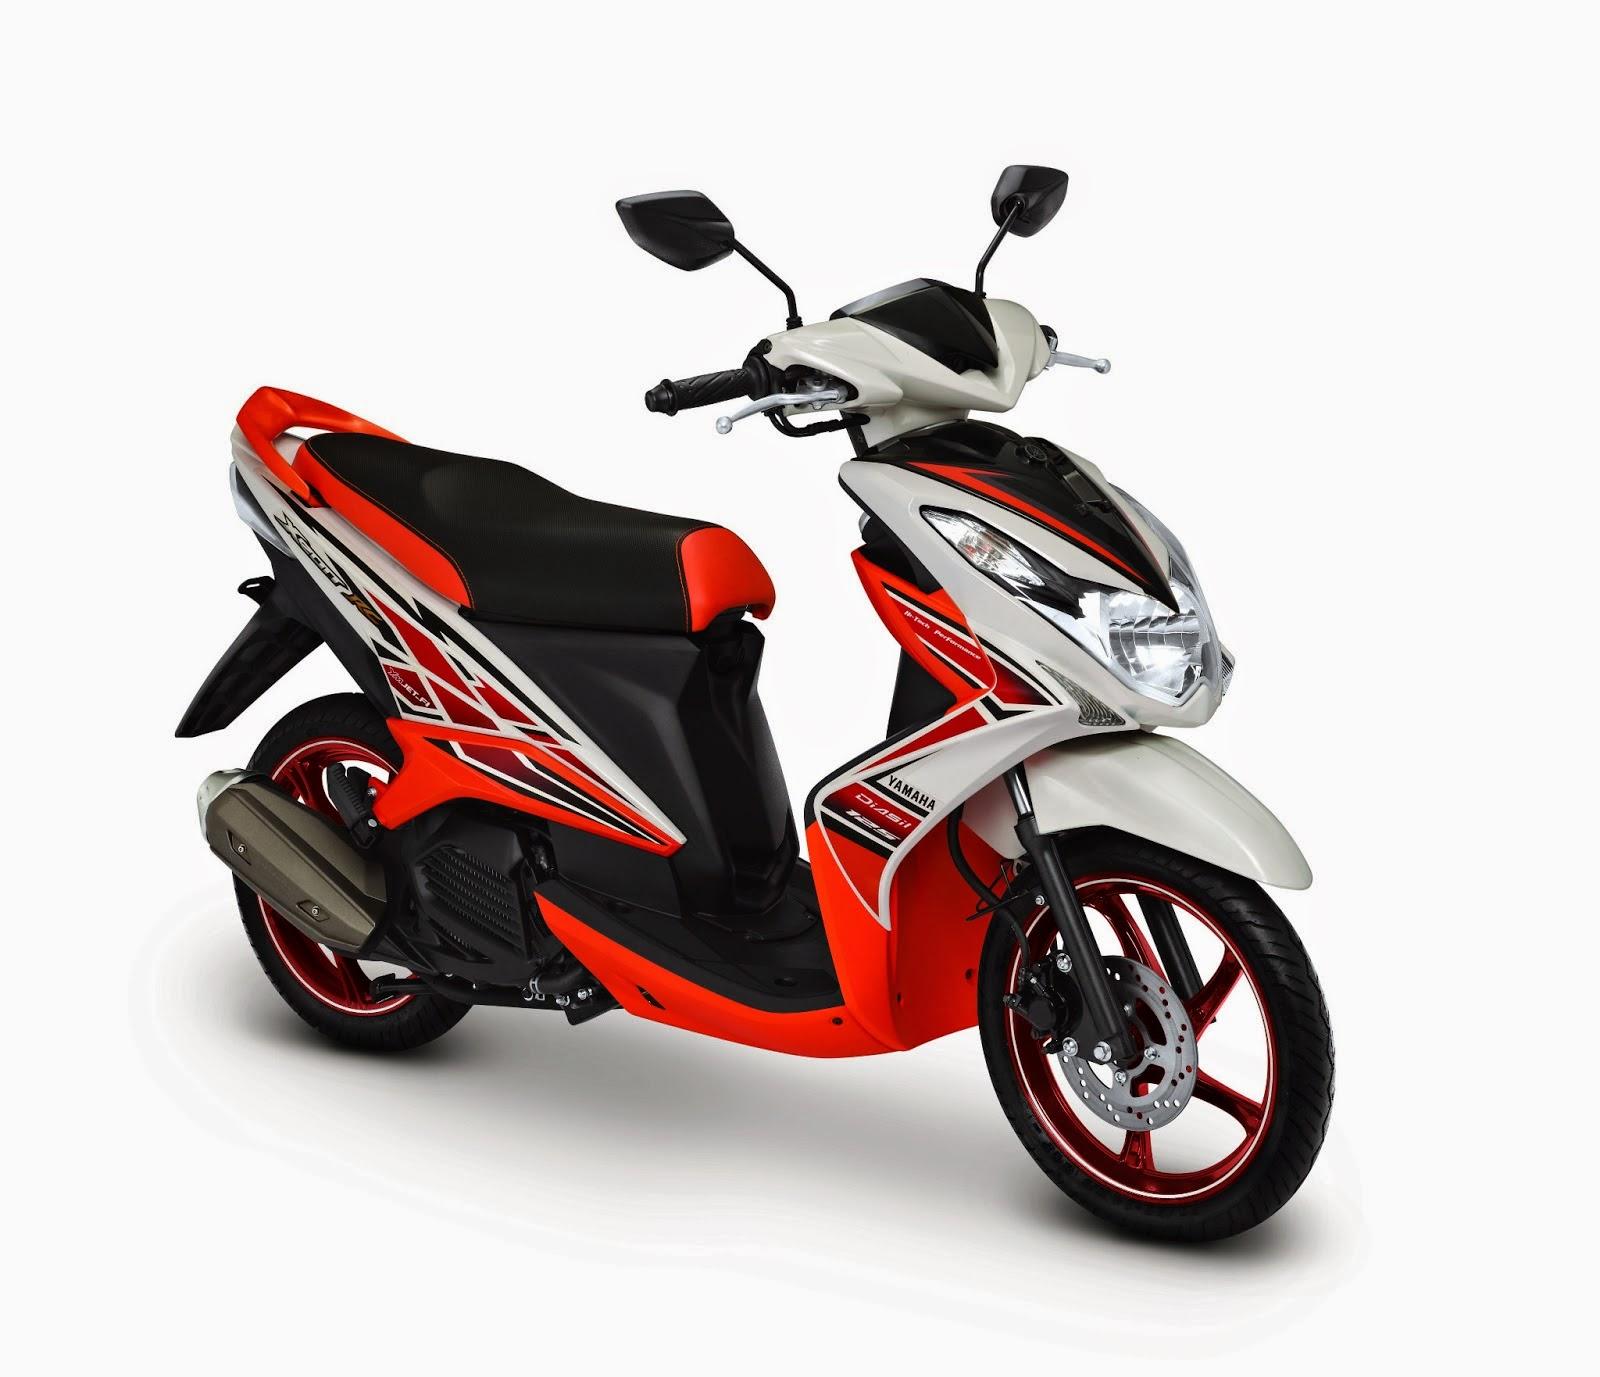 Daftar Harga Motor Yamaha | Free Modifikasi Motor